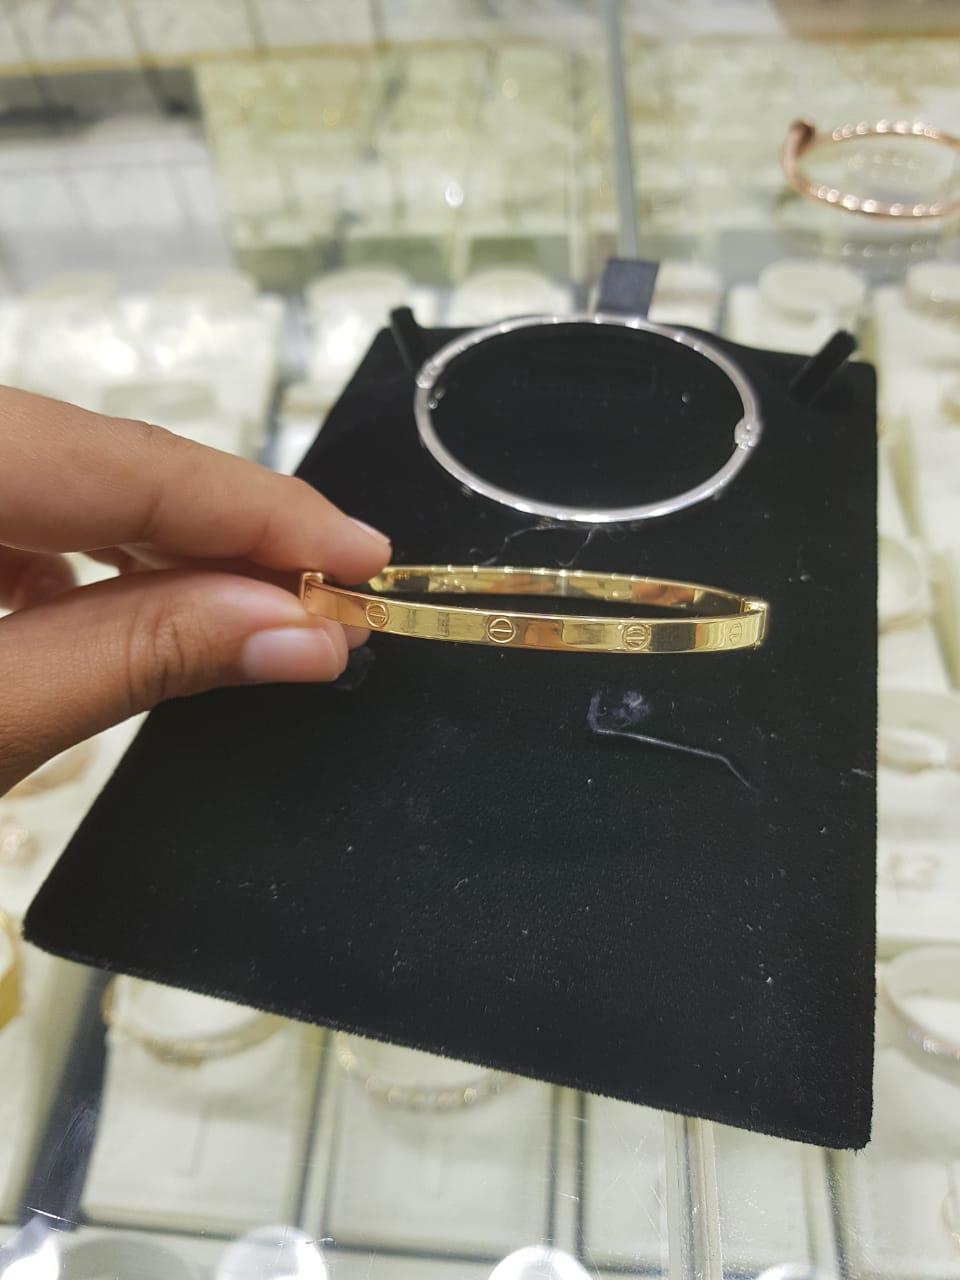 بالصور: مجوهرات بالرياض مقلدة لماركة 549ede3b-f022-4a3e-9